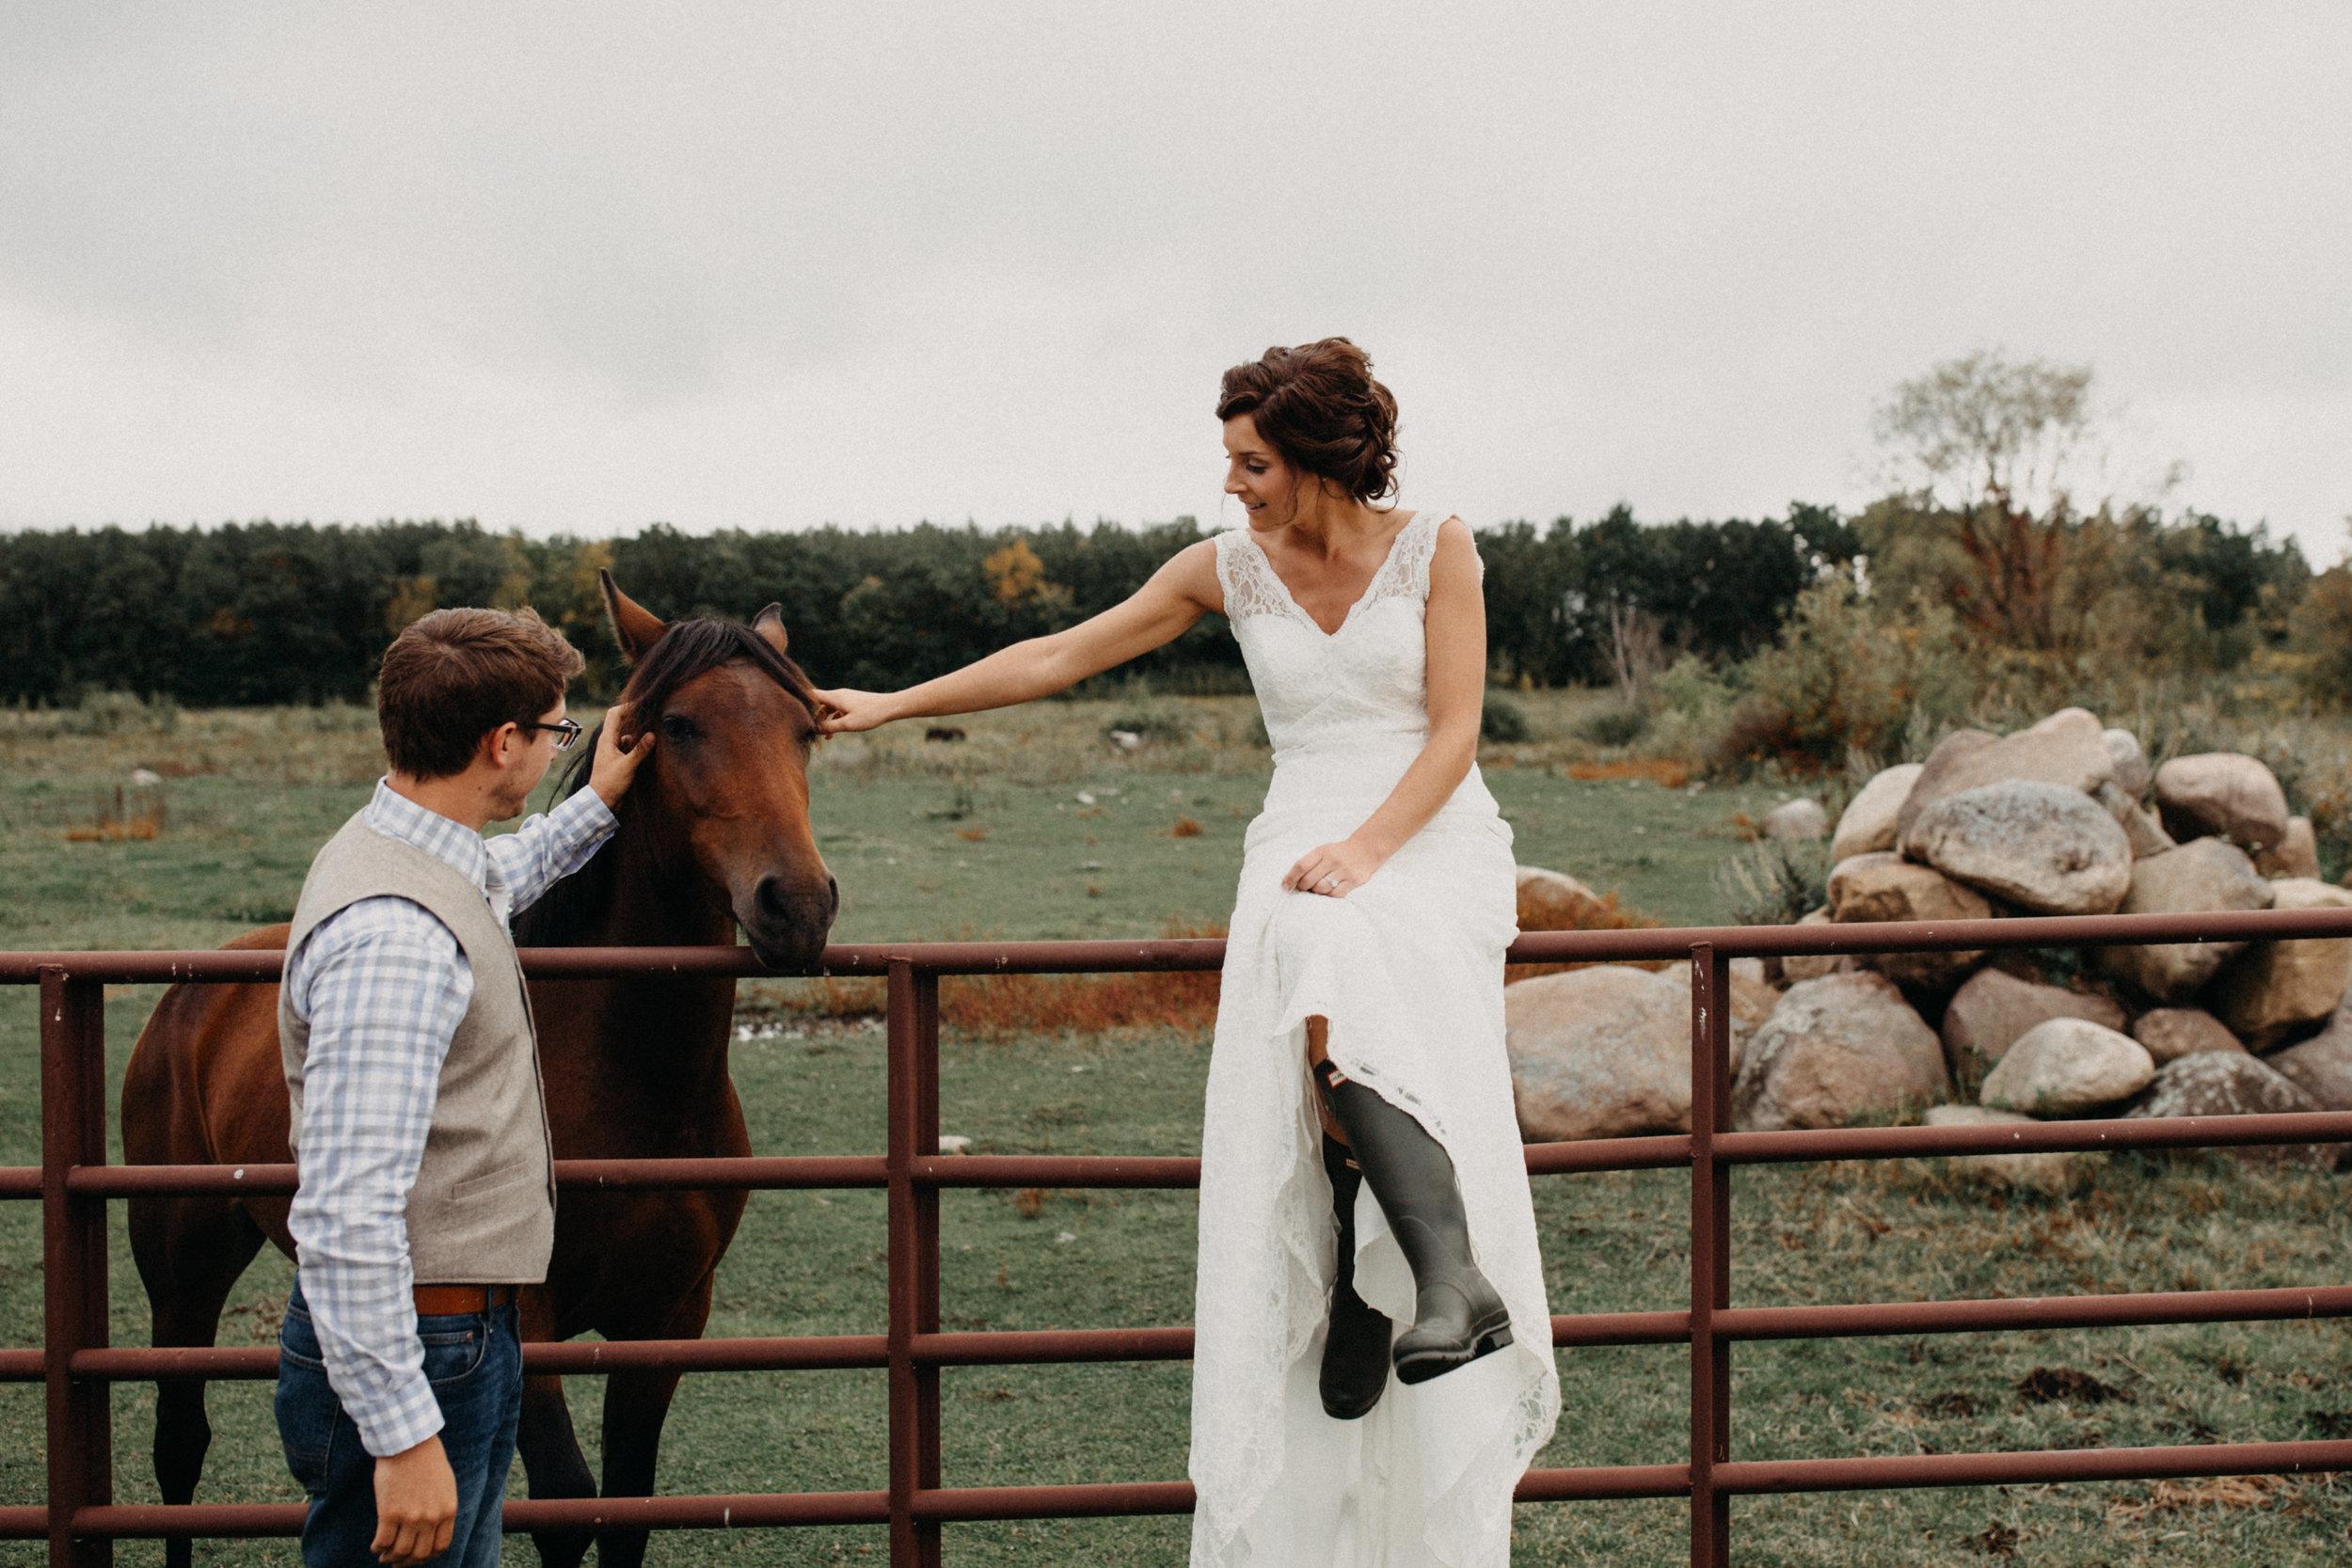 Outdoor farm wedding in Brainerd Minnesota